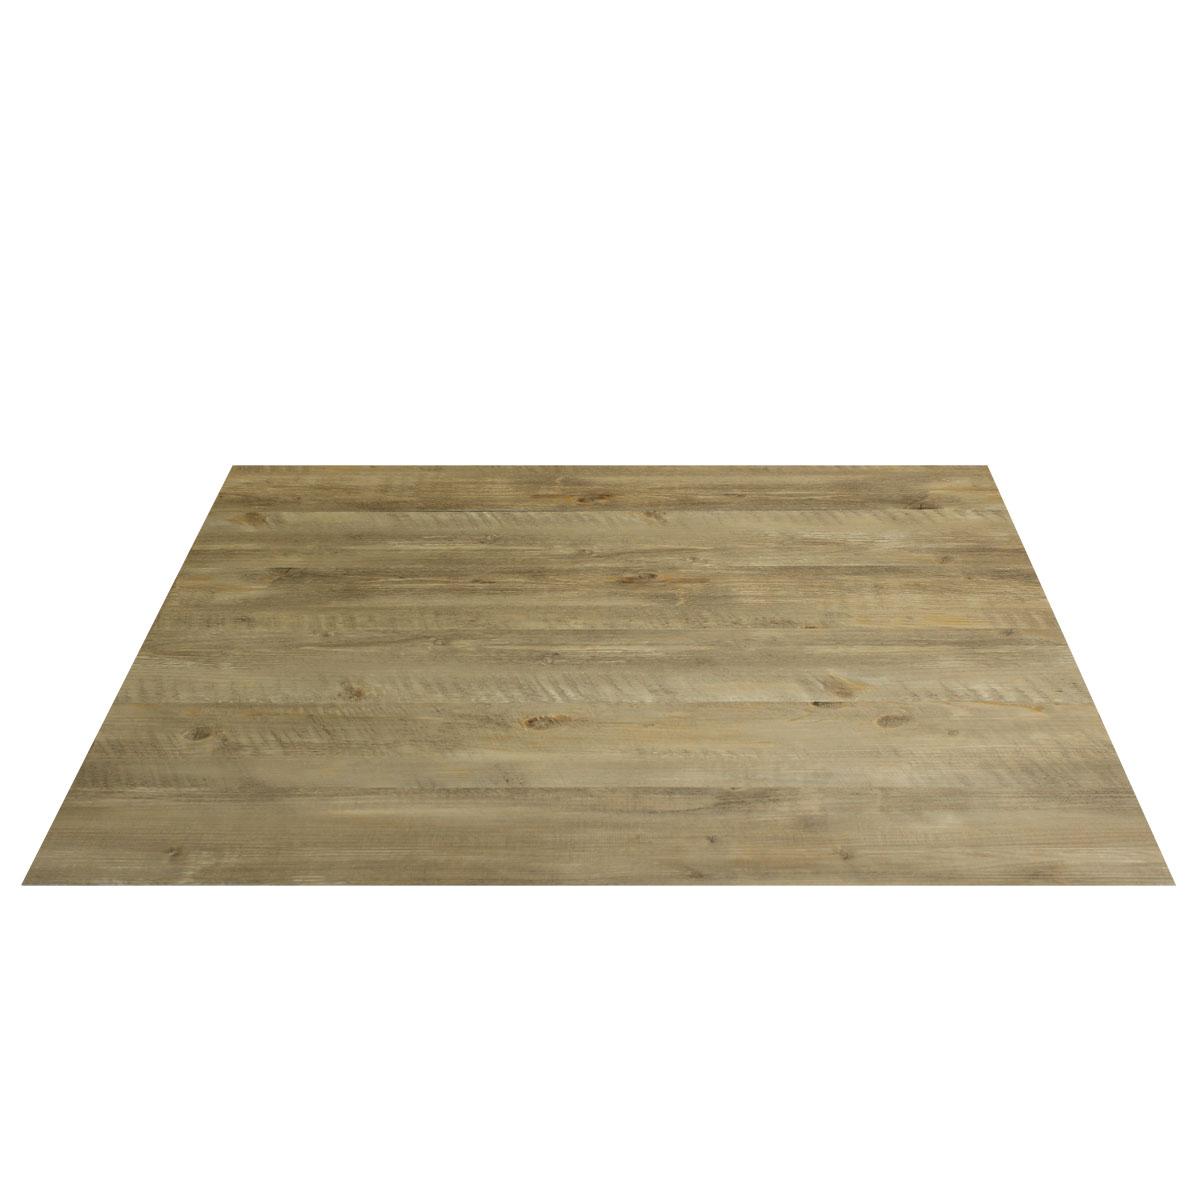 neuholz vinyl laminat selbstklebend eiche hell dielen planken vinylboden ebay. Black Bedroom Furniture Sets. Home Design Ideas